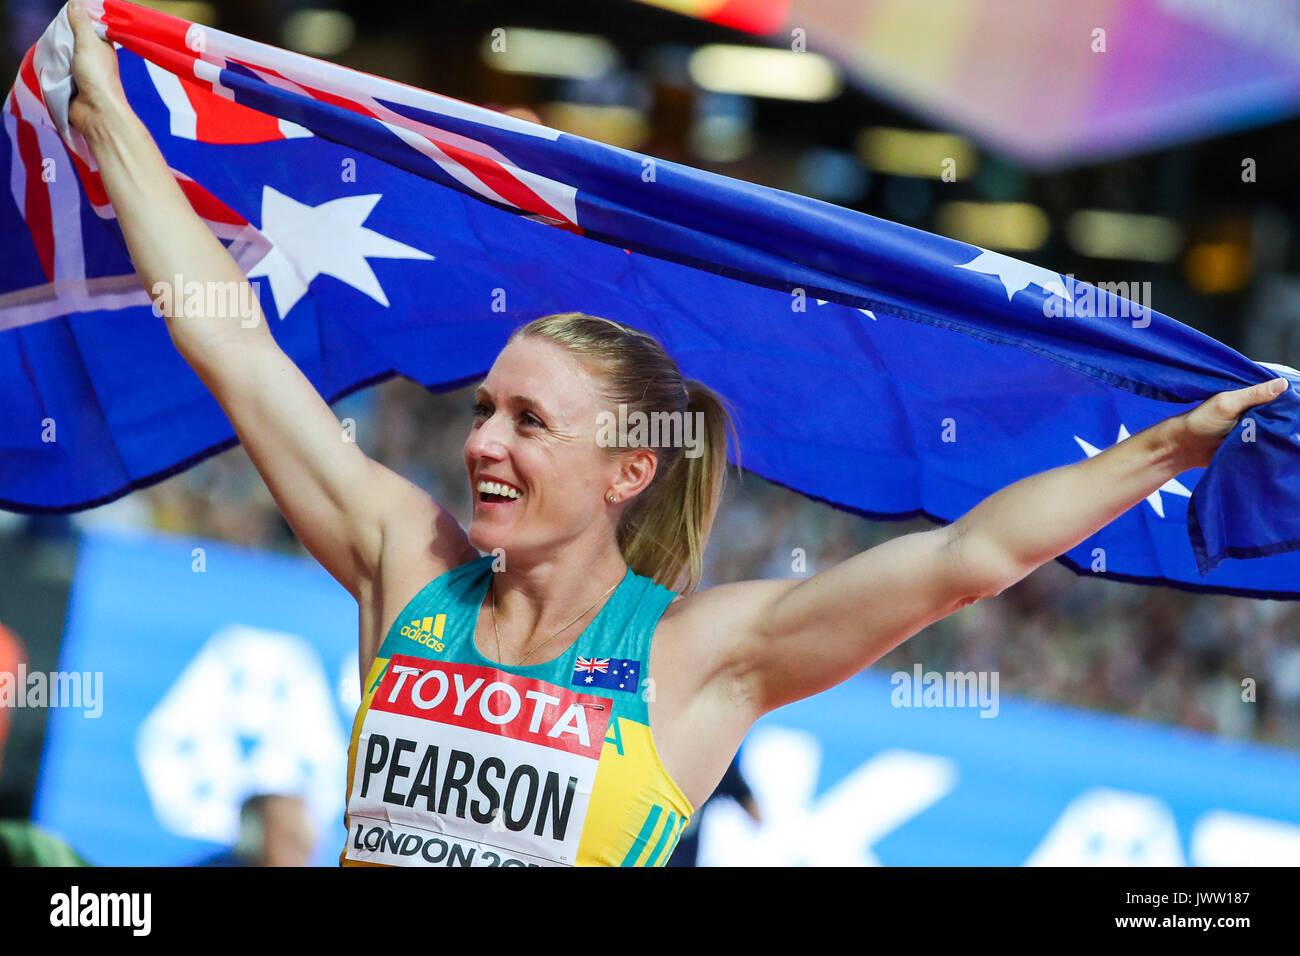 London, Großbritannien. 12 Aug, 2017. Sally Pearson, Australien, Sieger des 100 der Frauen m Hürden Finale am Tag neun der IAAF London 2017 Weltmeisterschaften am London Stadion. Credit: Paul Davey/Alamy leben Nachrichten Stockbild